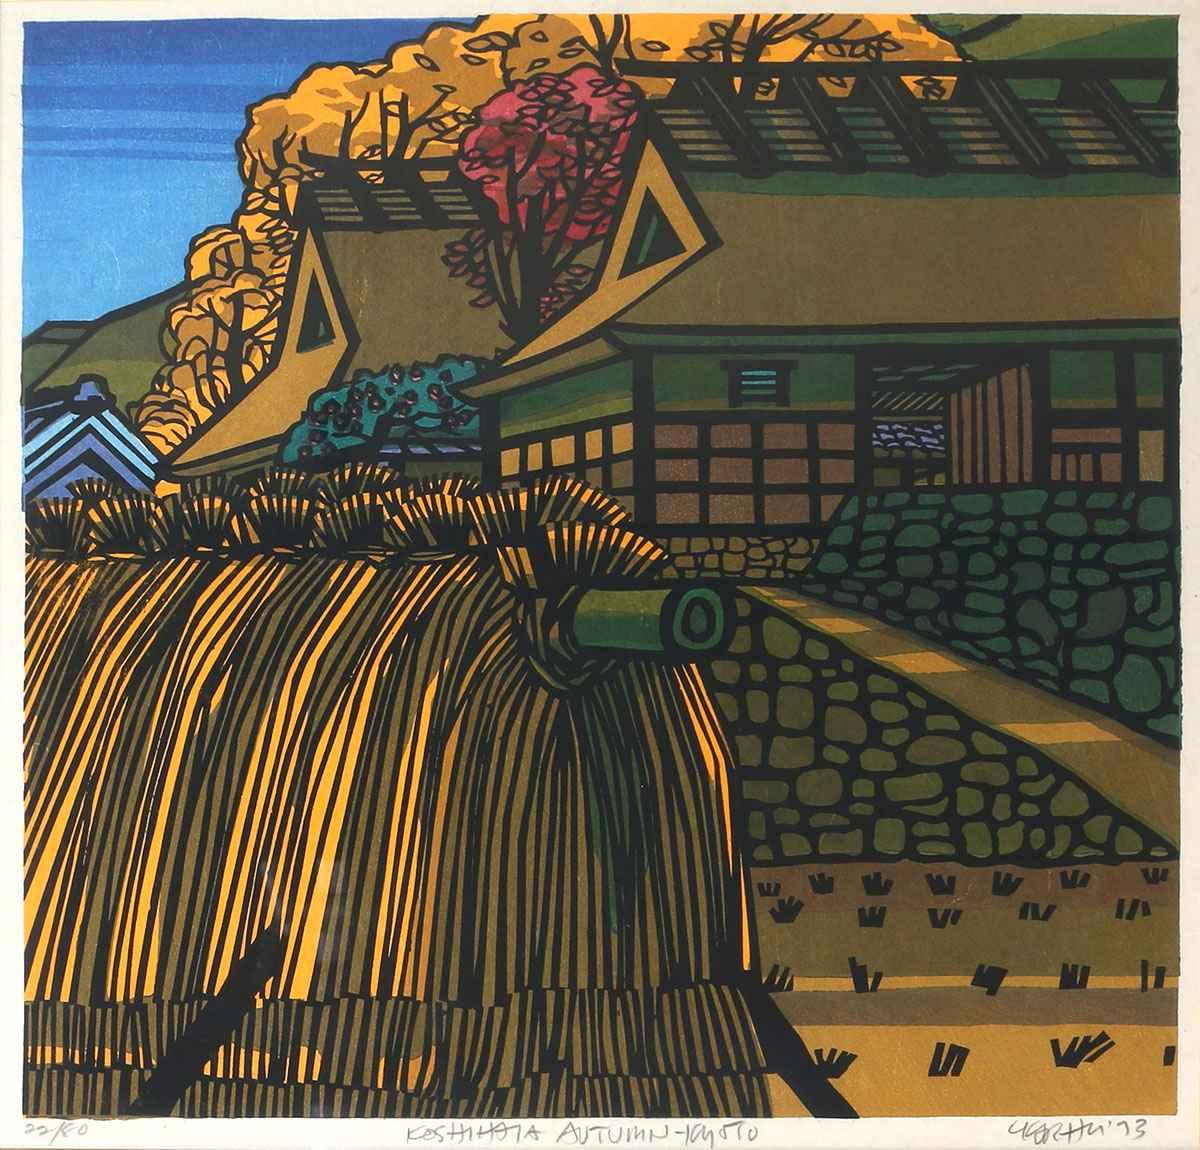 Koshihata Autumn-Kyoto by  Clifton Karhu - Masterpiece Online